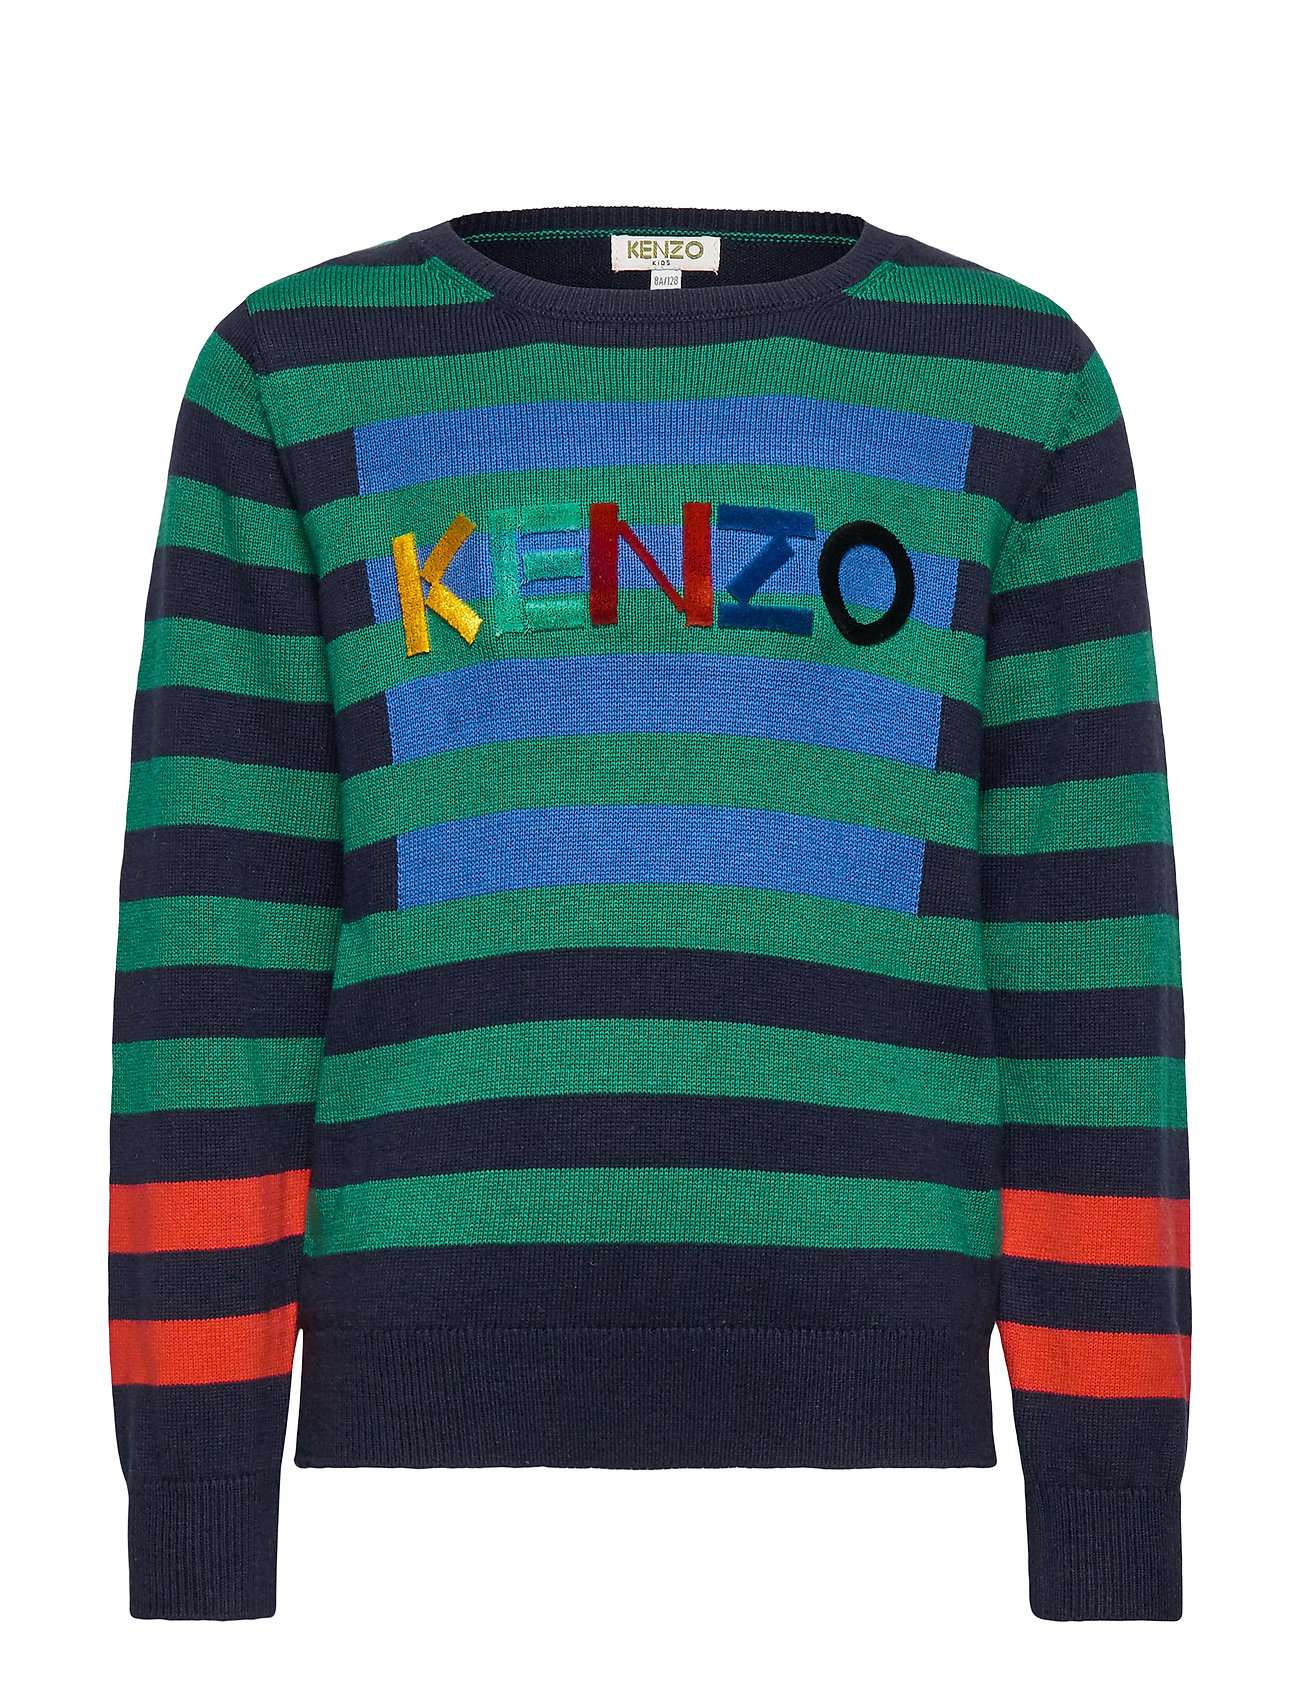 Kenzo GERY - MARINE BLUE